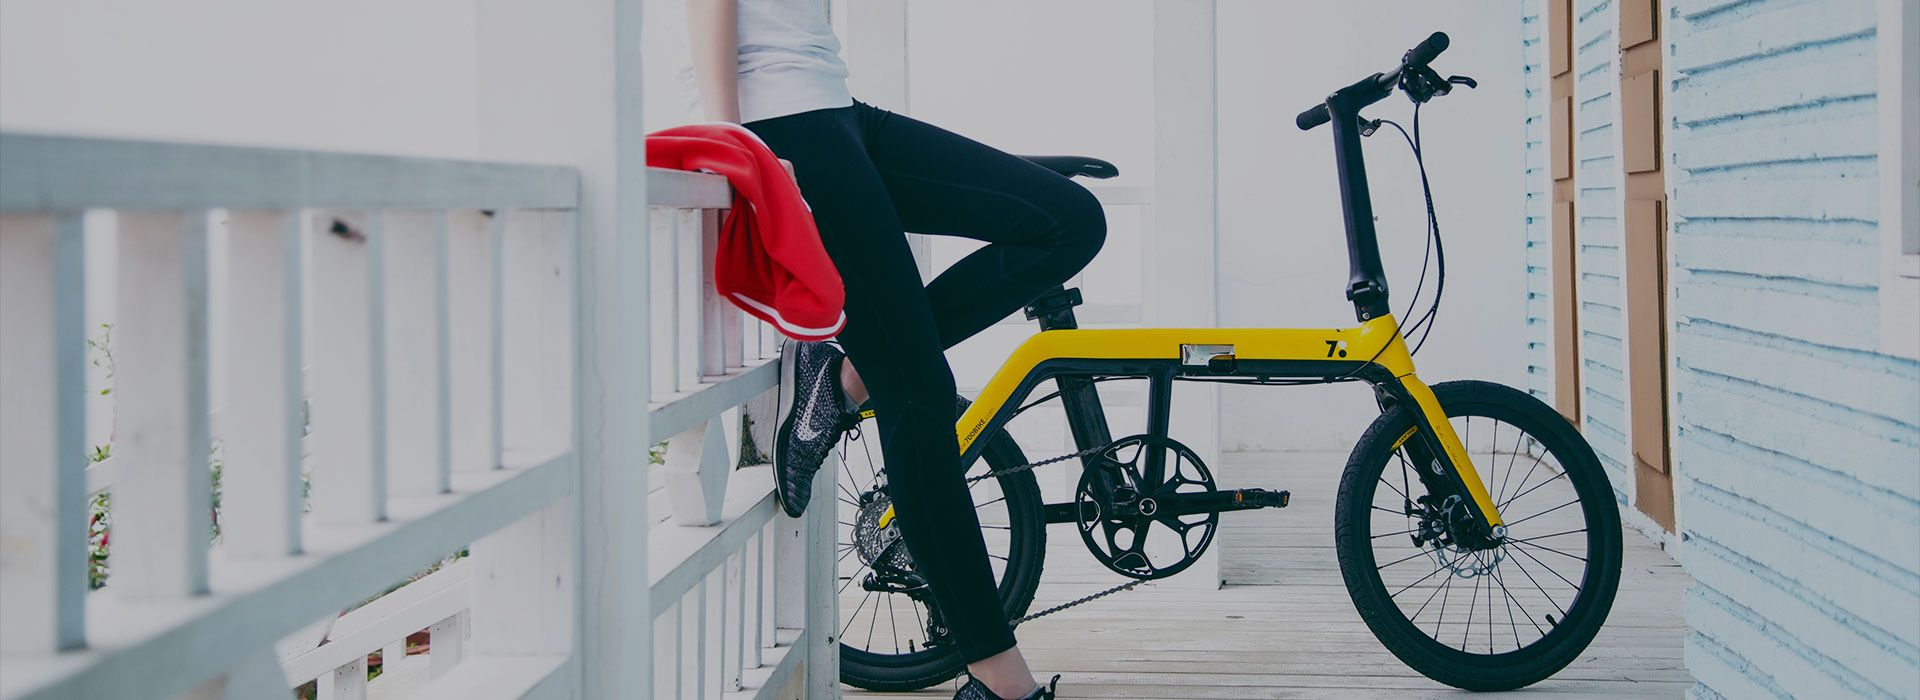 Galaxy 700bike Com Urban Bike Bike Bicycle